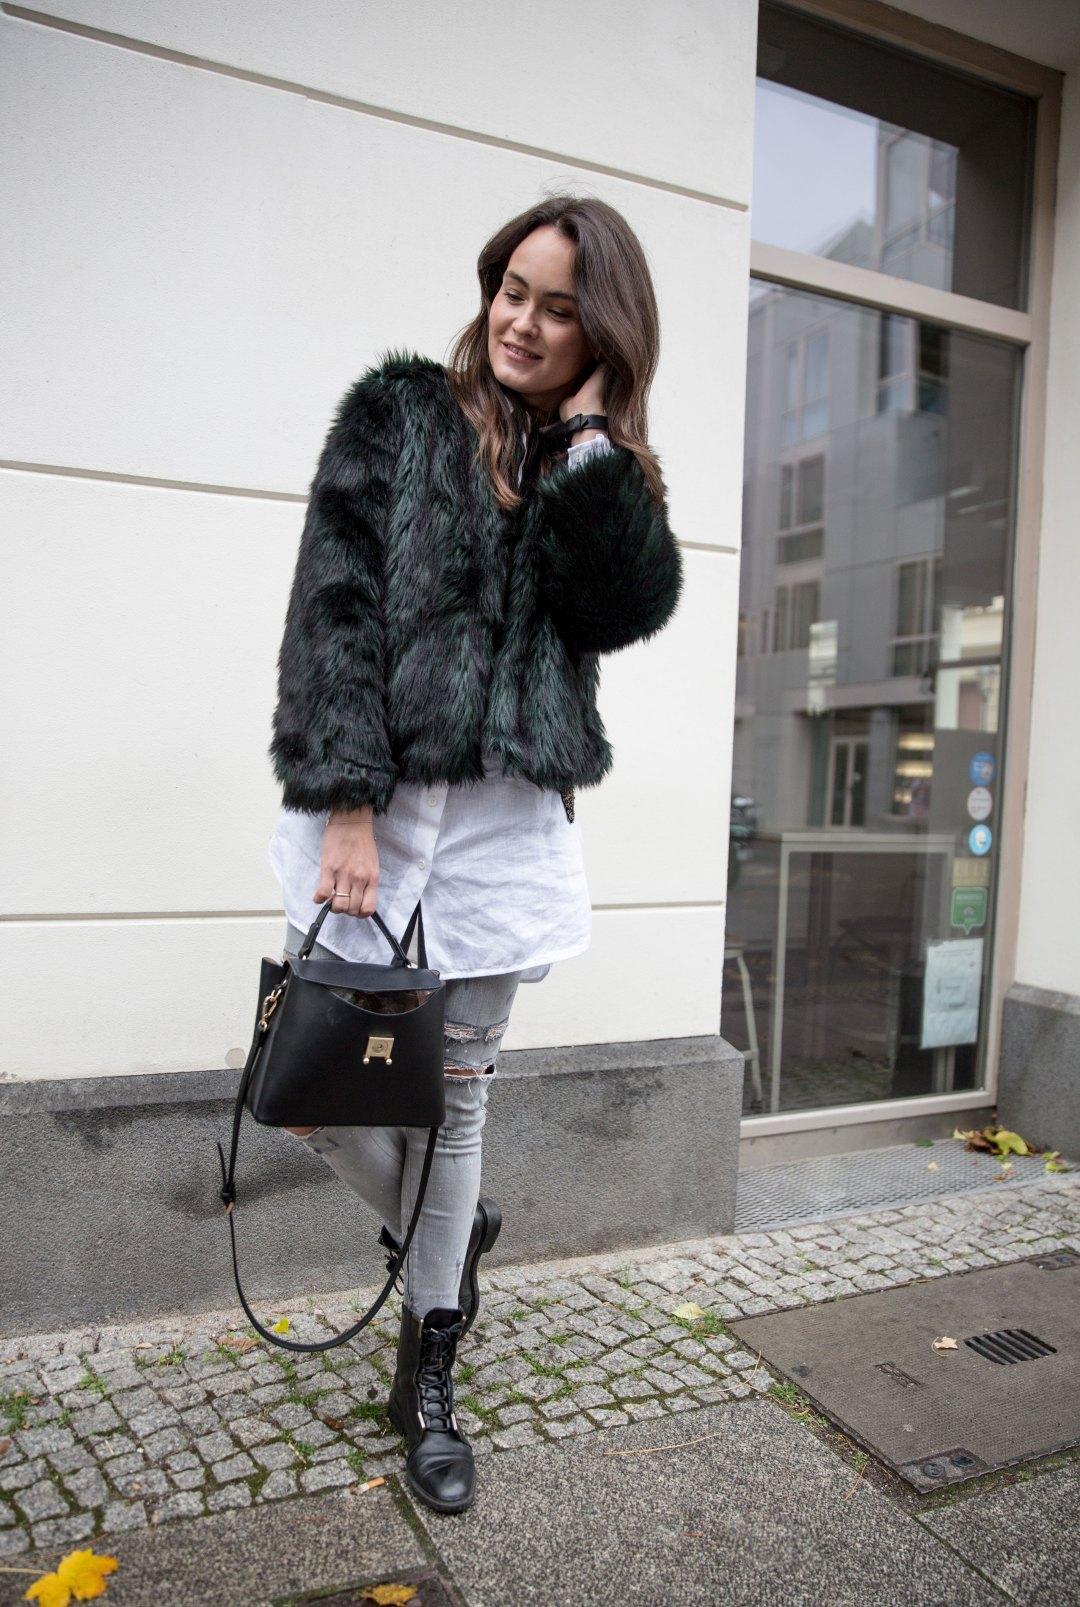 Cozyfur_im_winter_1